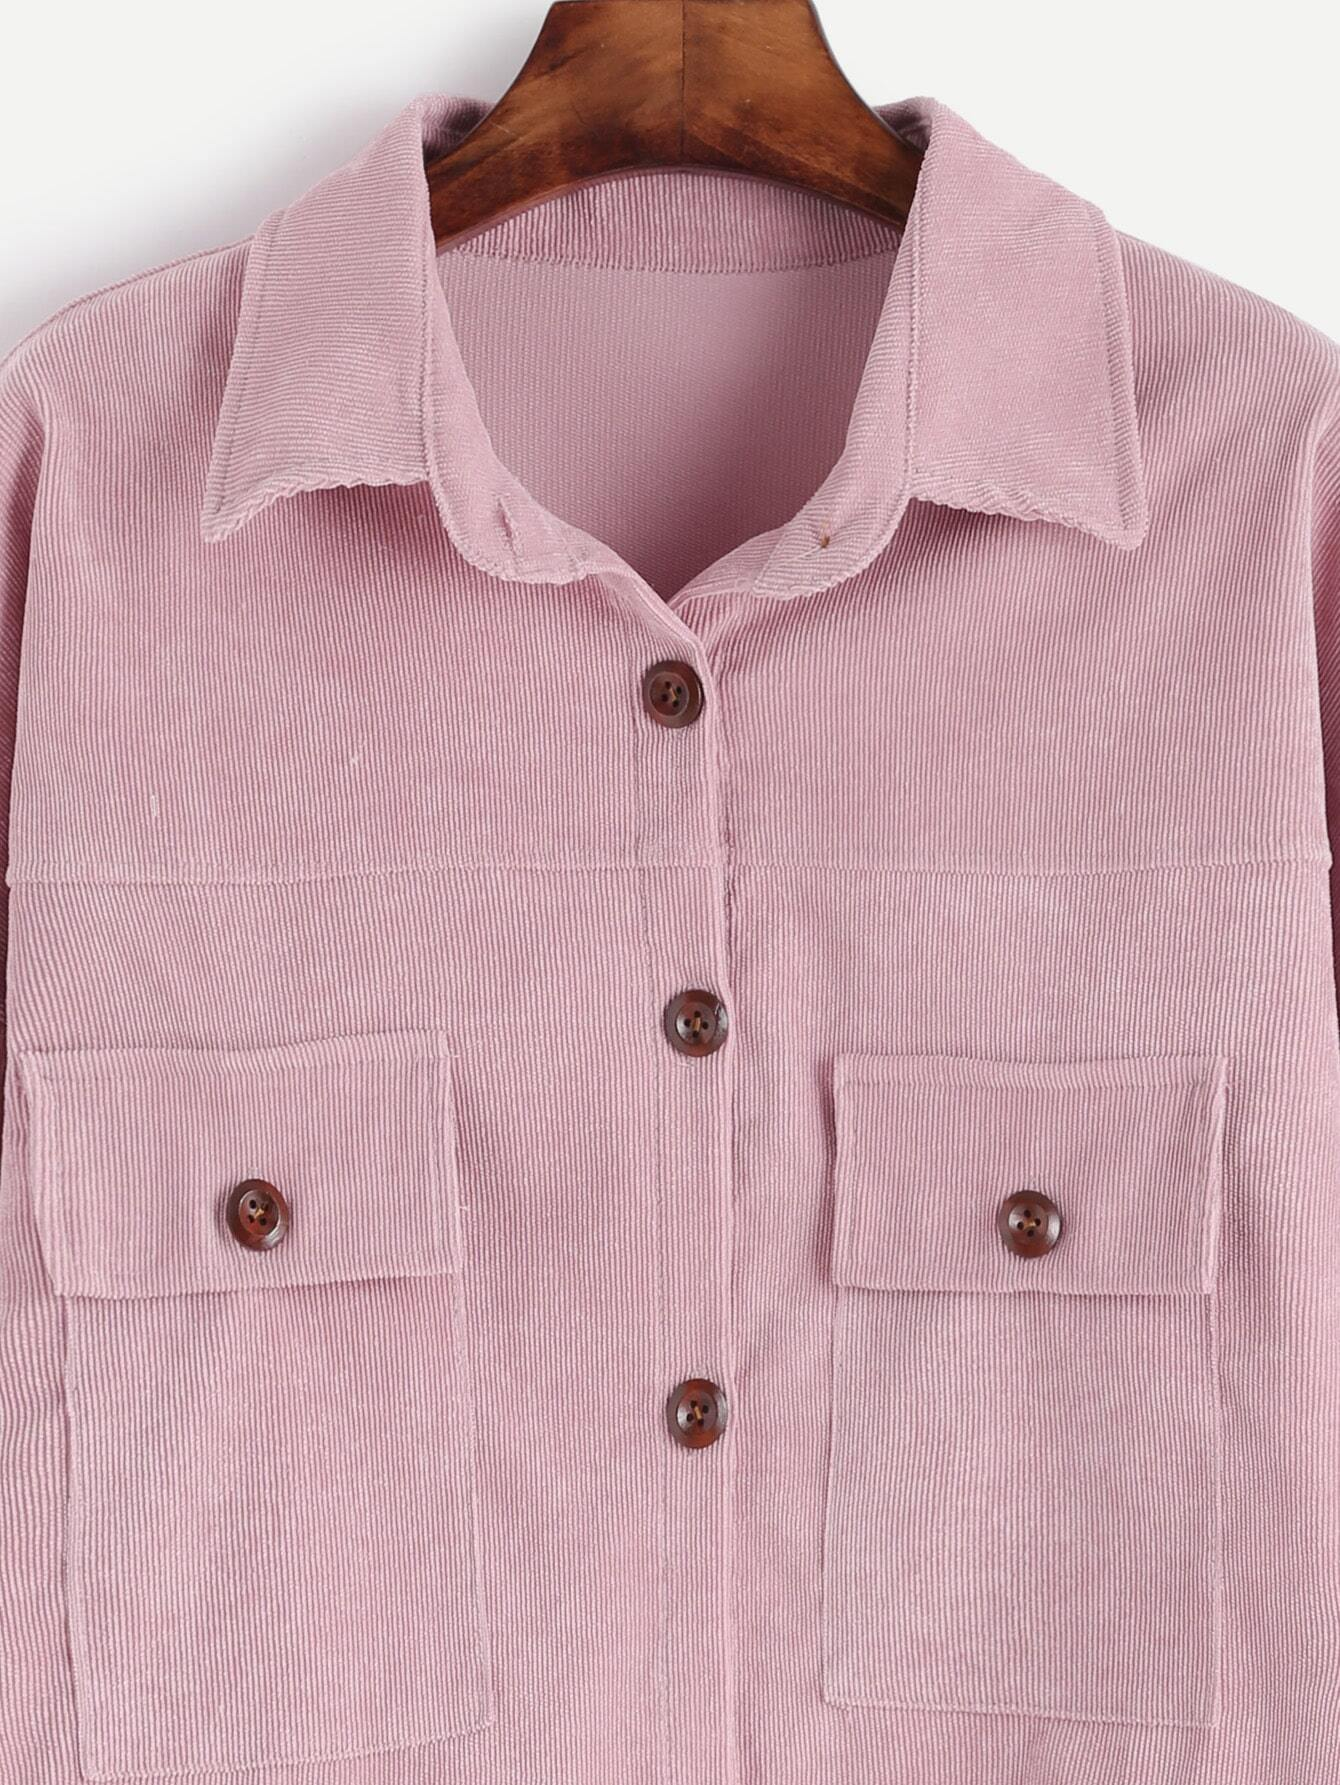 blouse161012004_2